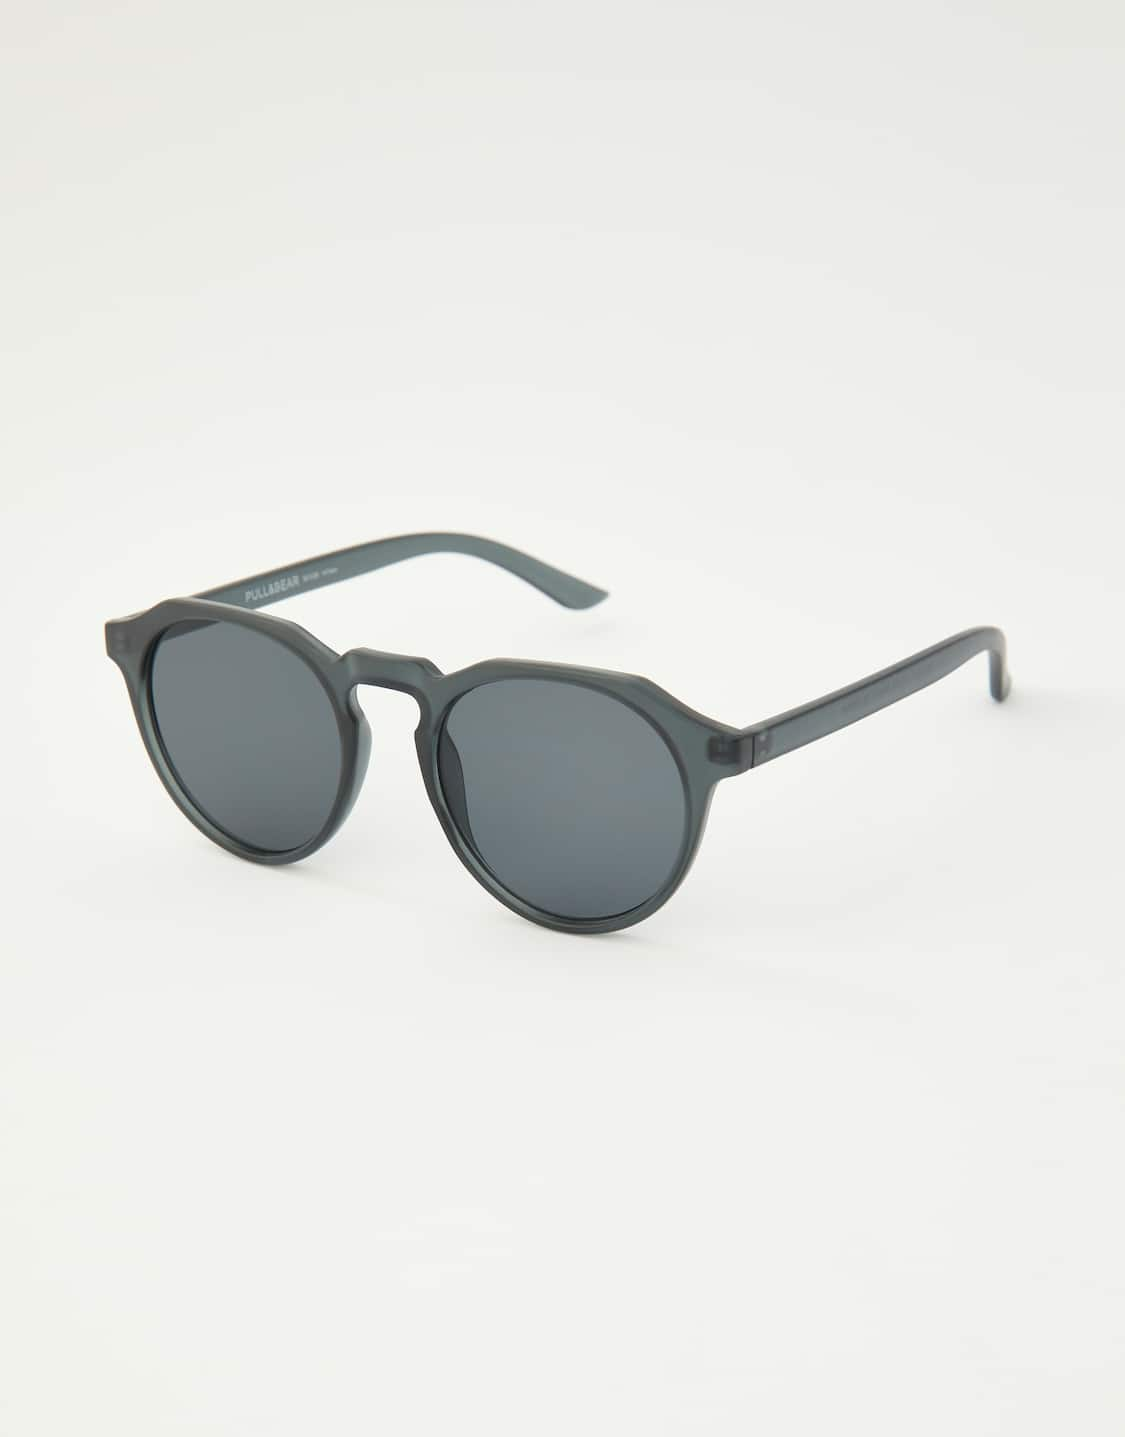 1e6feba915 Gafas sol grises - PULL&BEAR